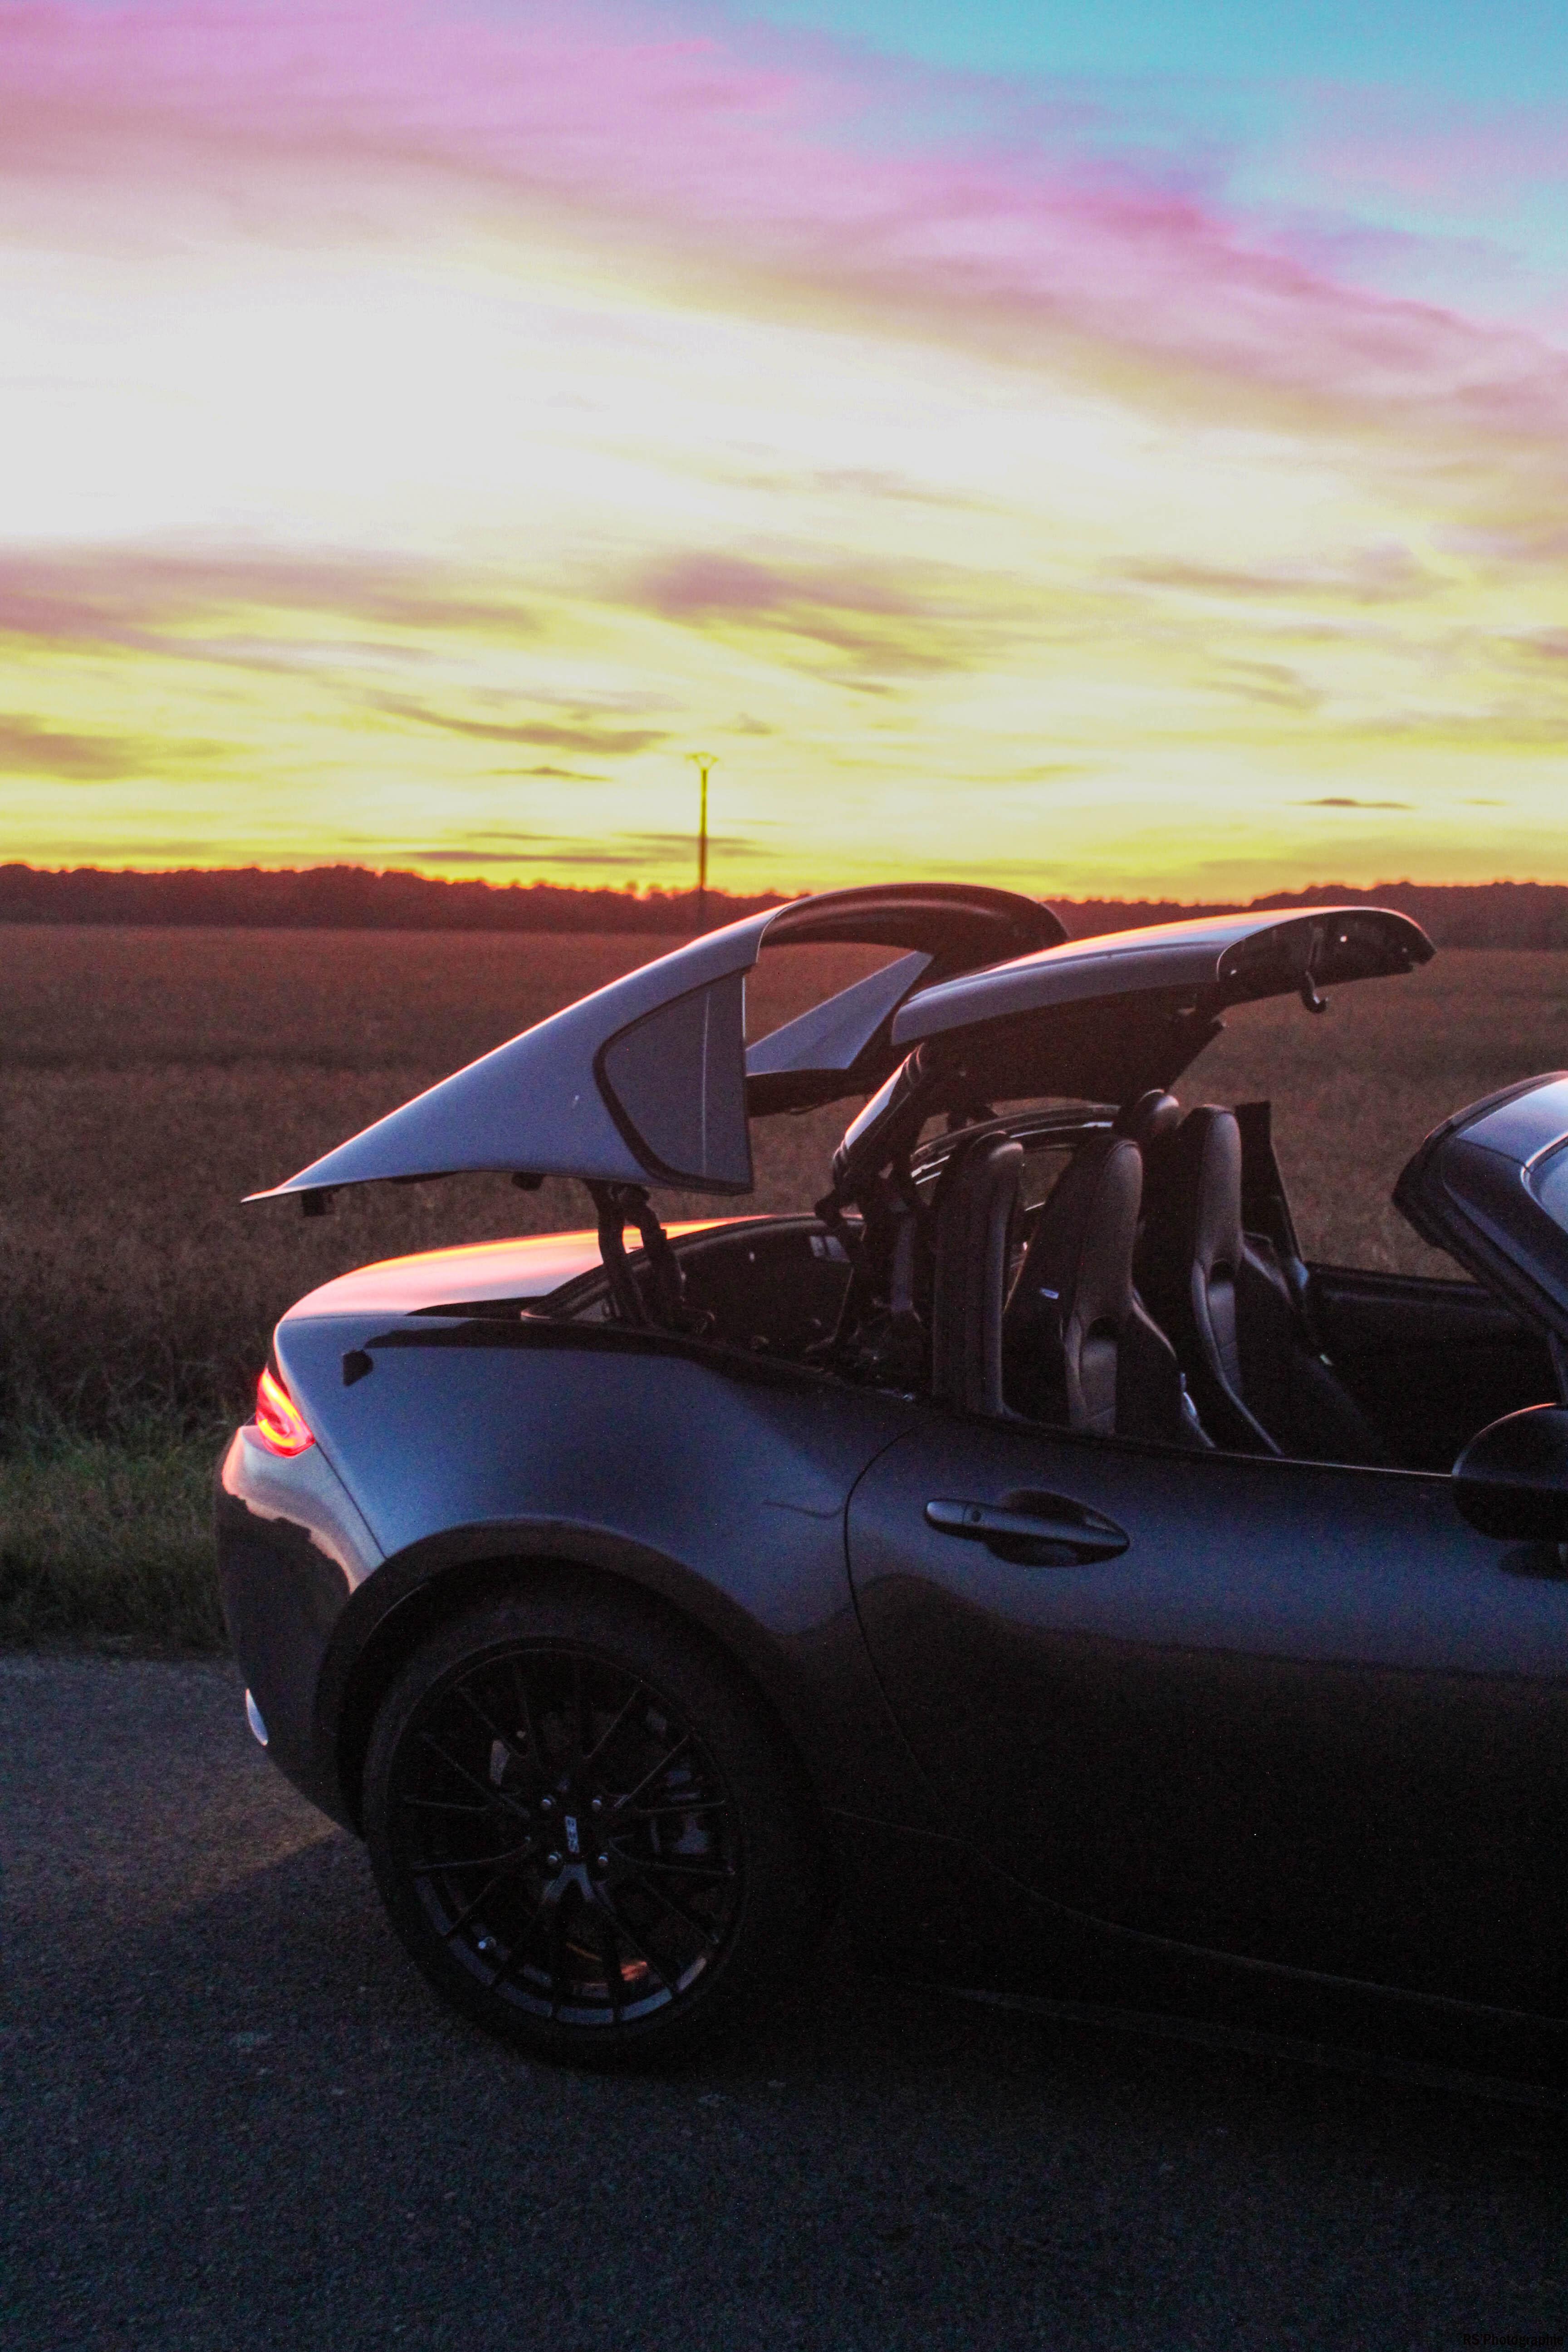 MazdaMX5RF31-mazda-mx5-rf-edition-profil-side-Arnaud Demasier-RSPhotographie